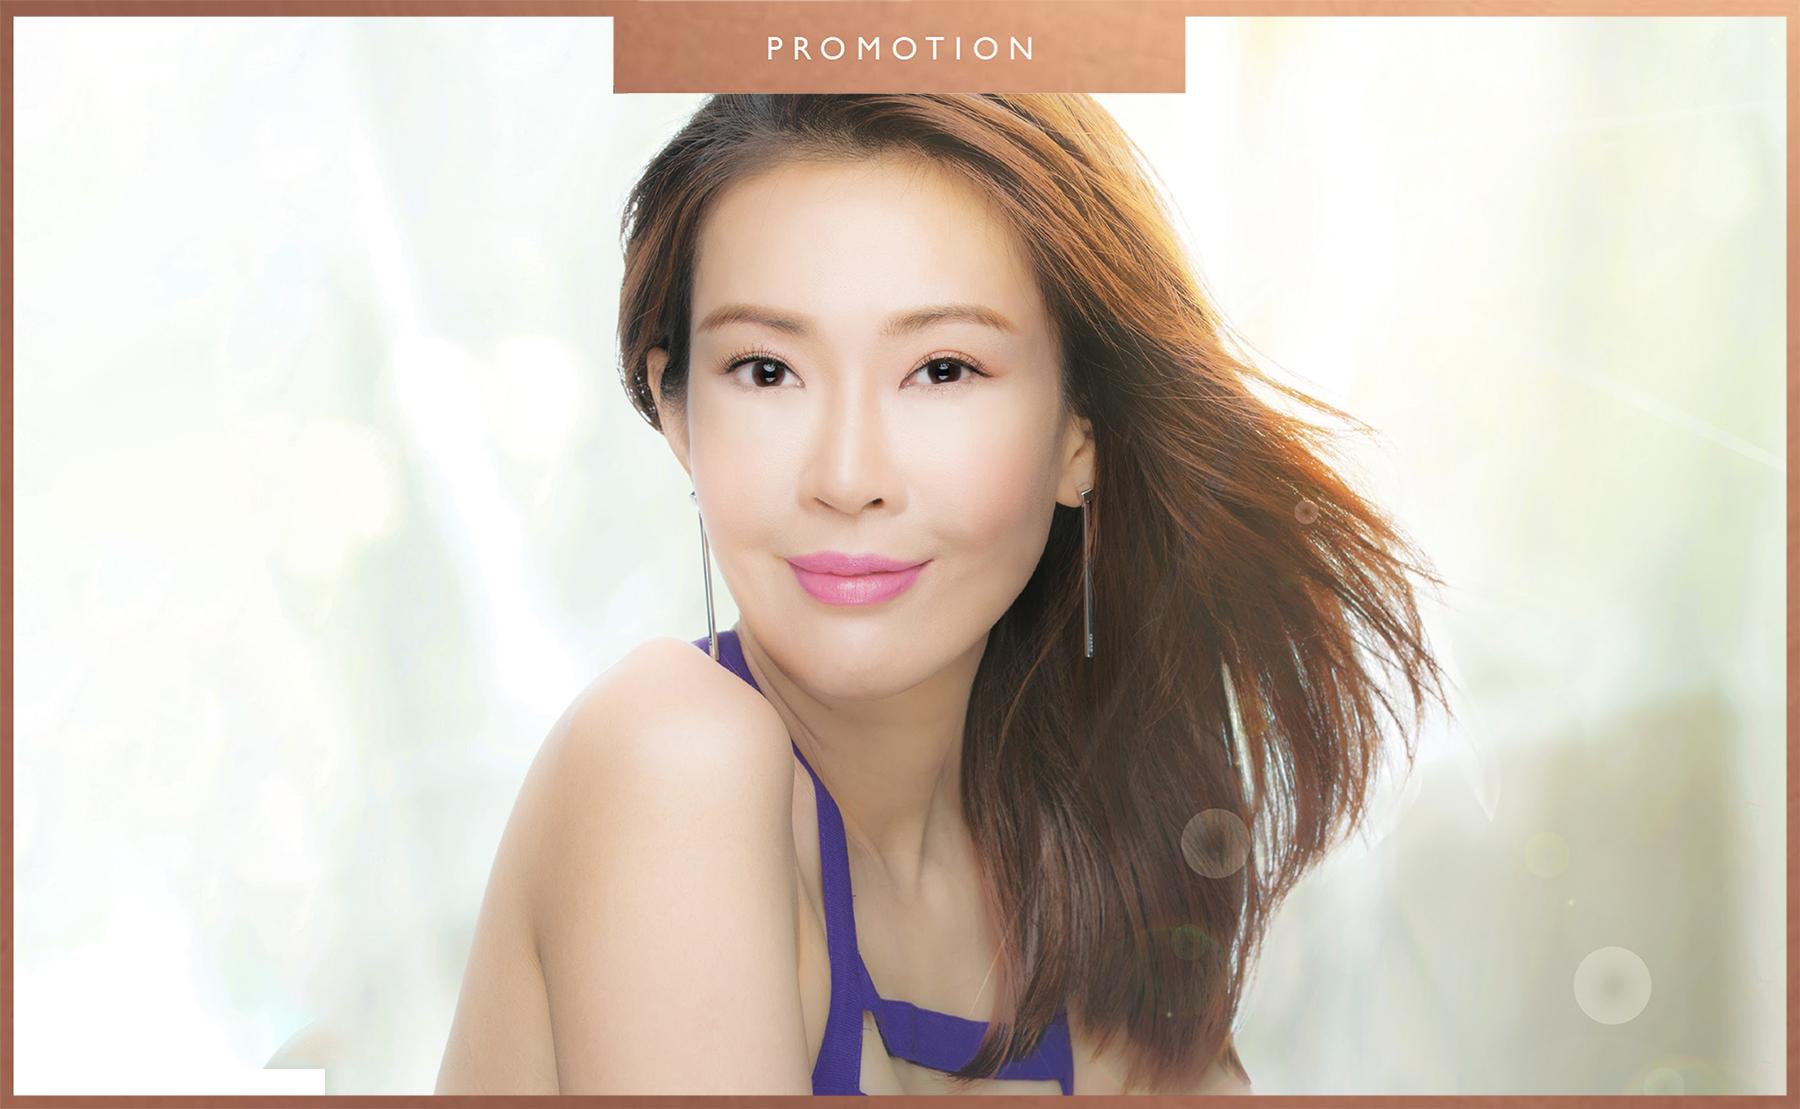 Promotion Vitamin Energy Facial Estetica